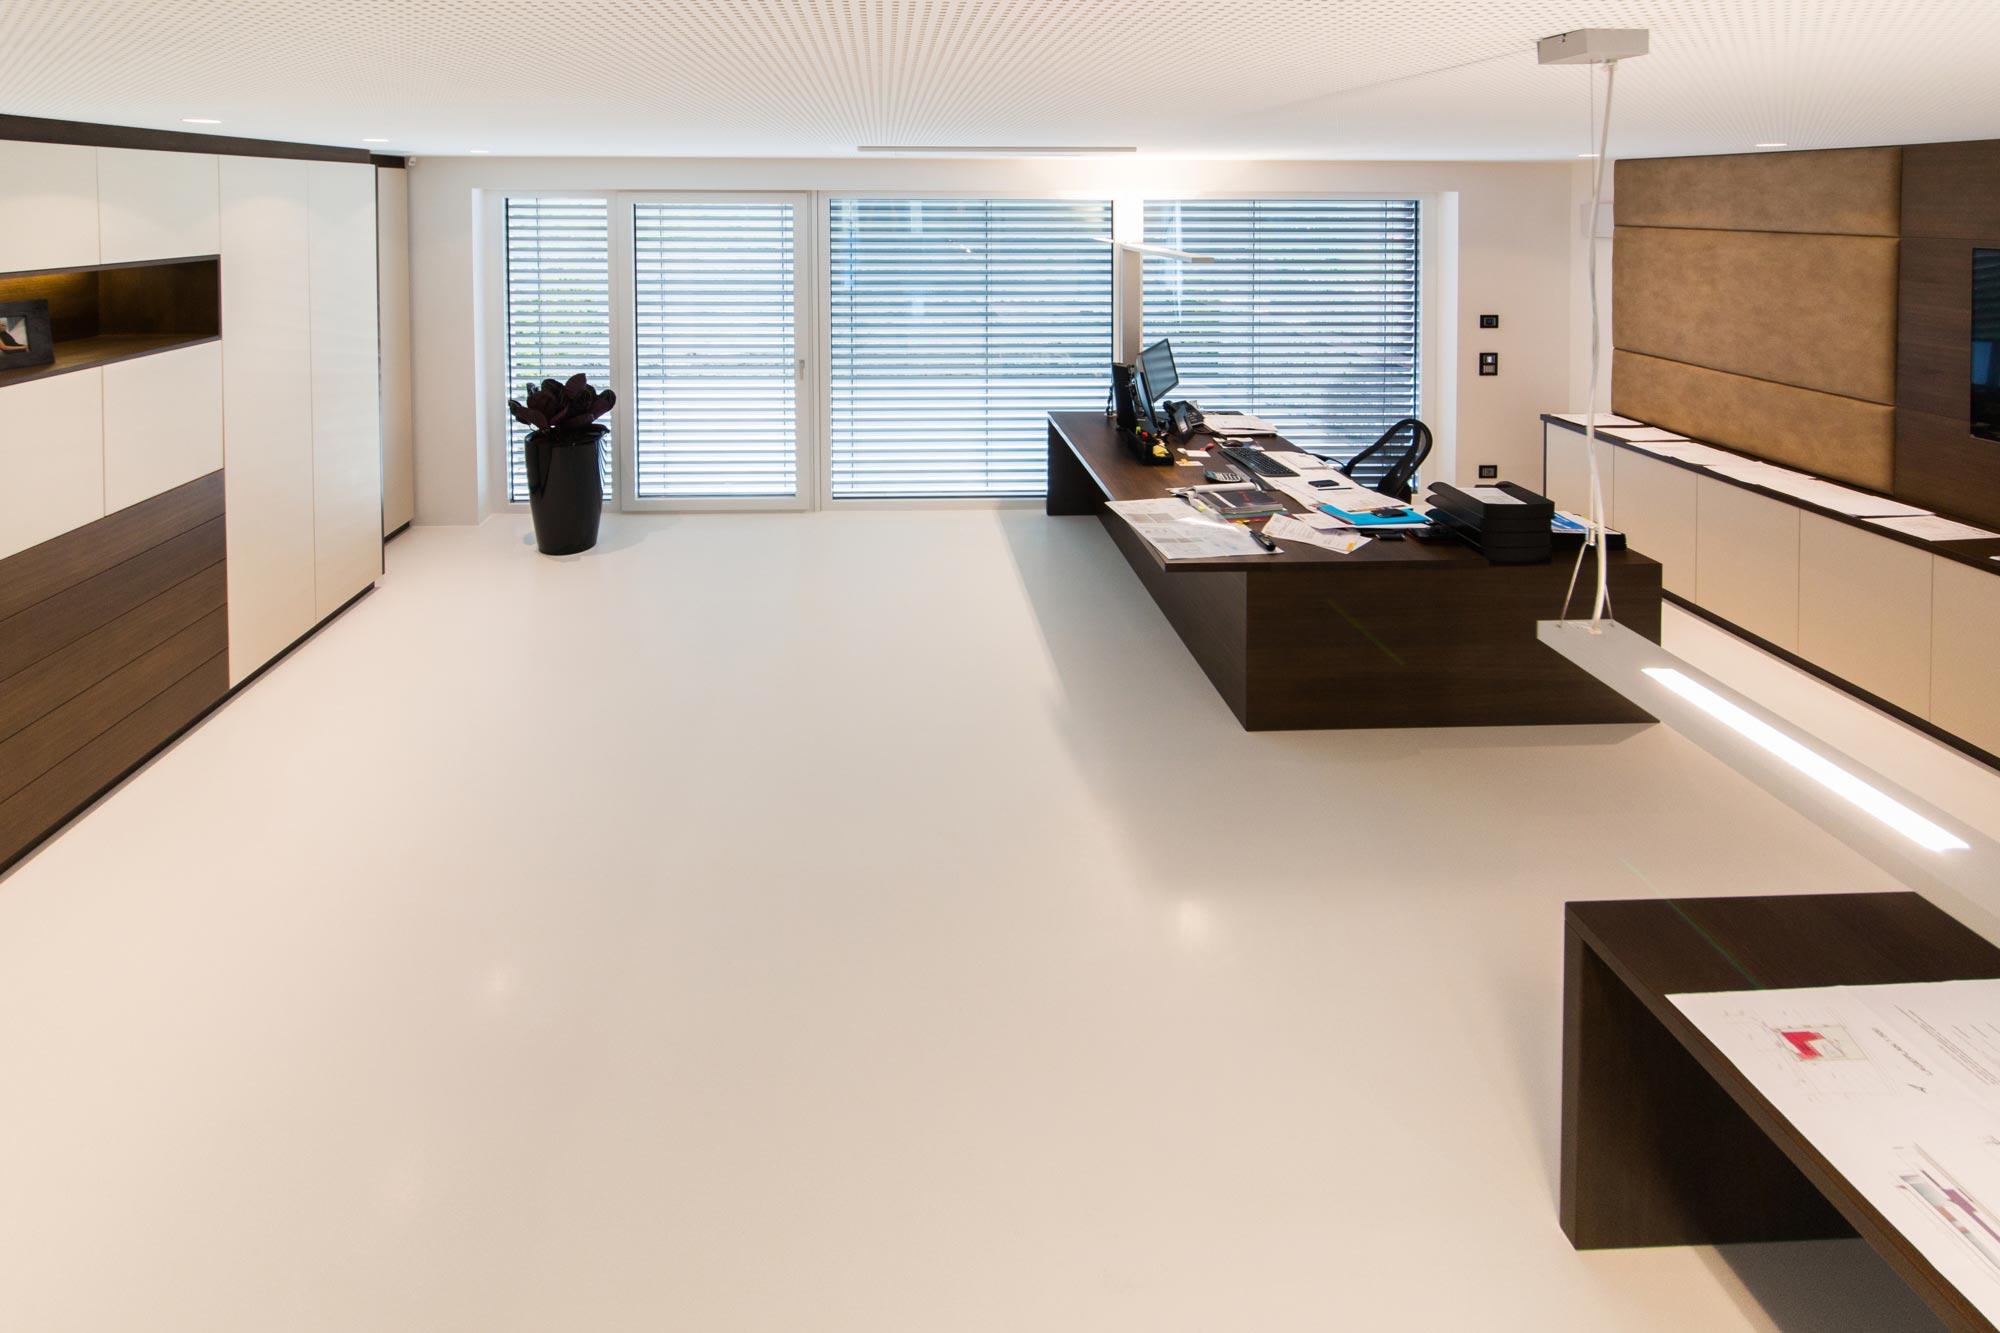 beschichtungen koch gmbh bodenbel ge innenausbau. Black Bedroom Furniture Sets. Home Design Ideas